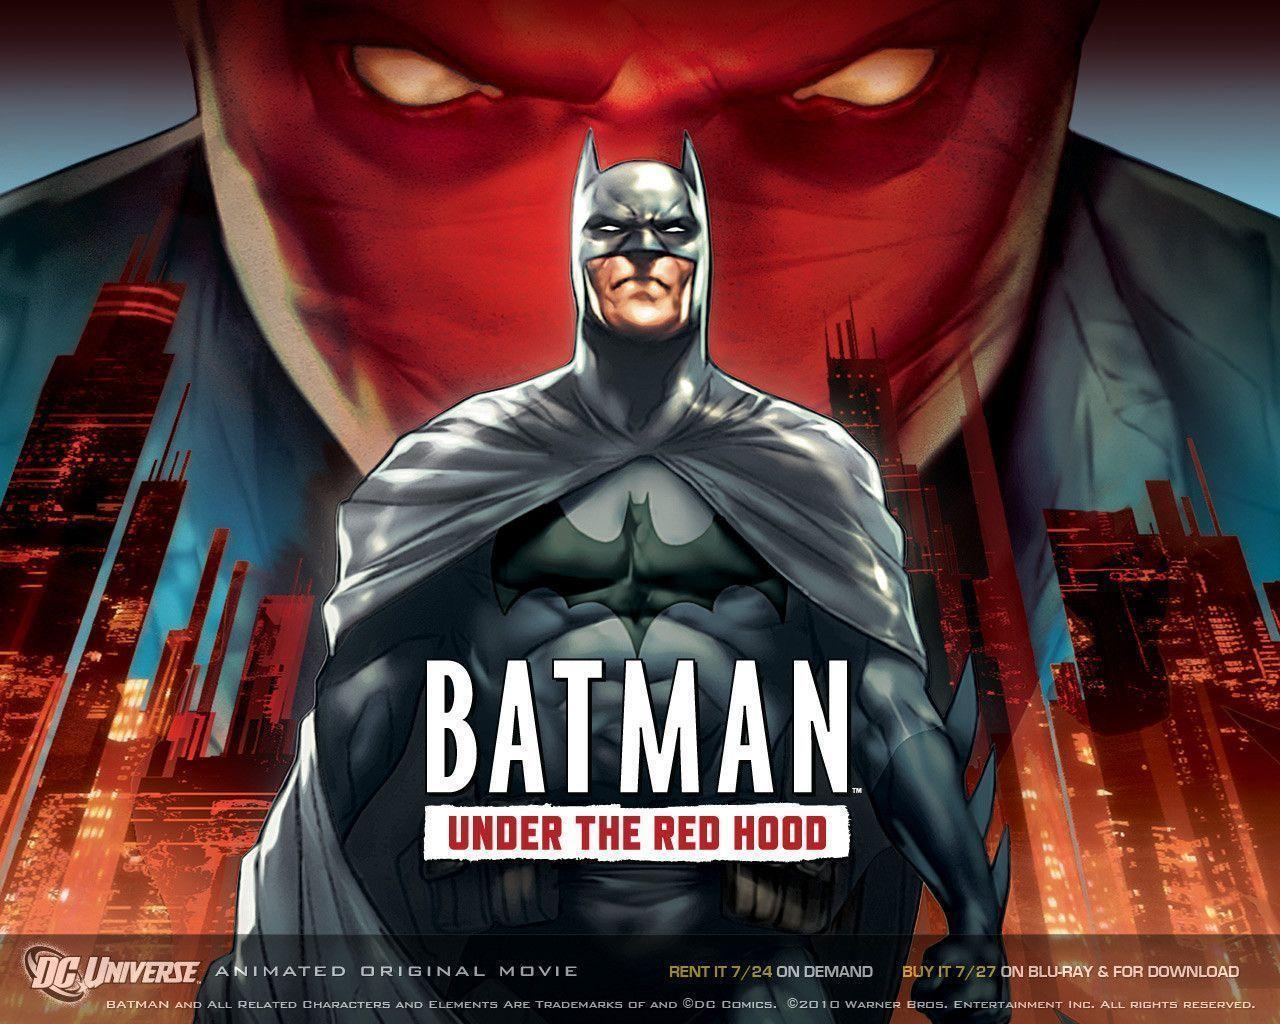 Batman Under the Red Hood 2010 DVDRiP XviD-QCF - Video ...